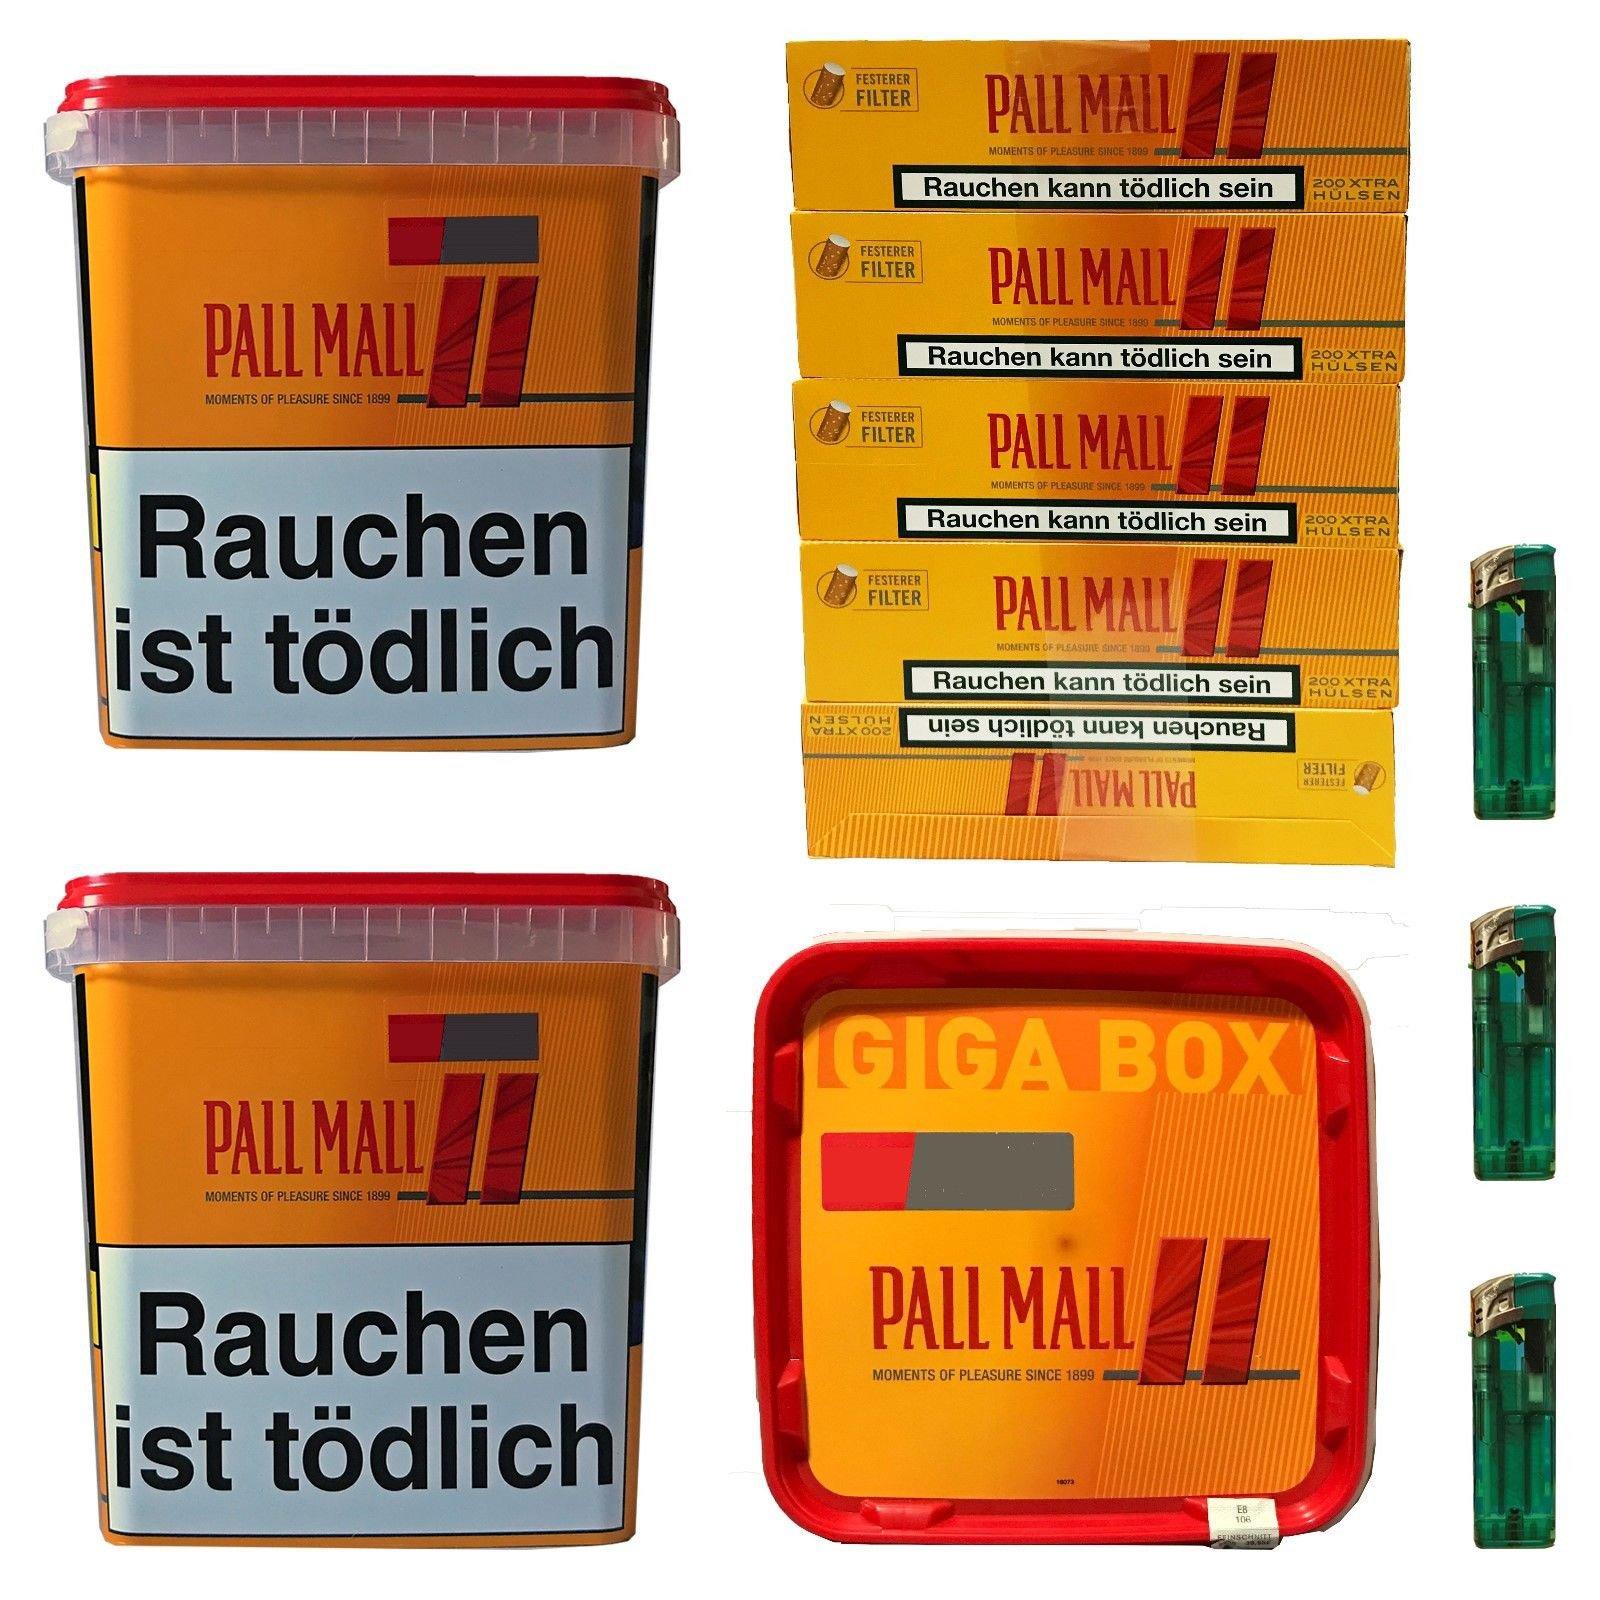 3x Pall Mall Giga Box 260 g Tabak / Volumentabak, Allround Hülsen, Feuerz